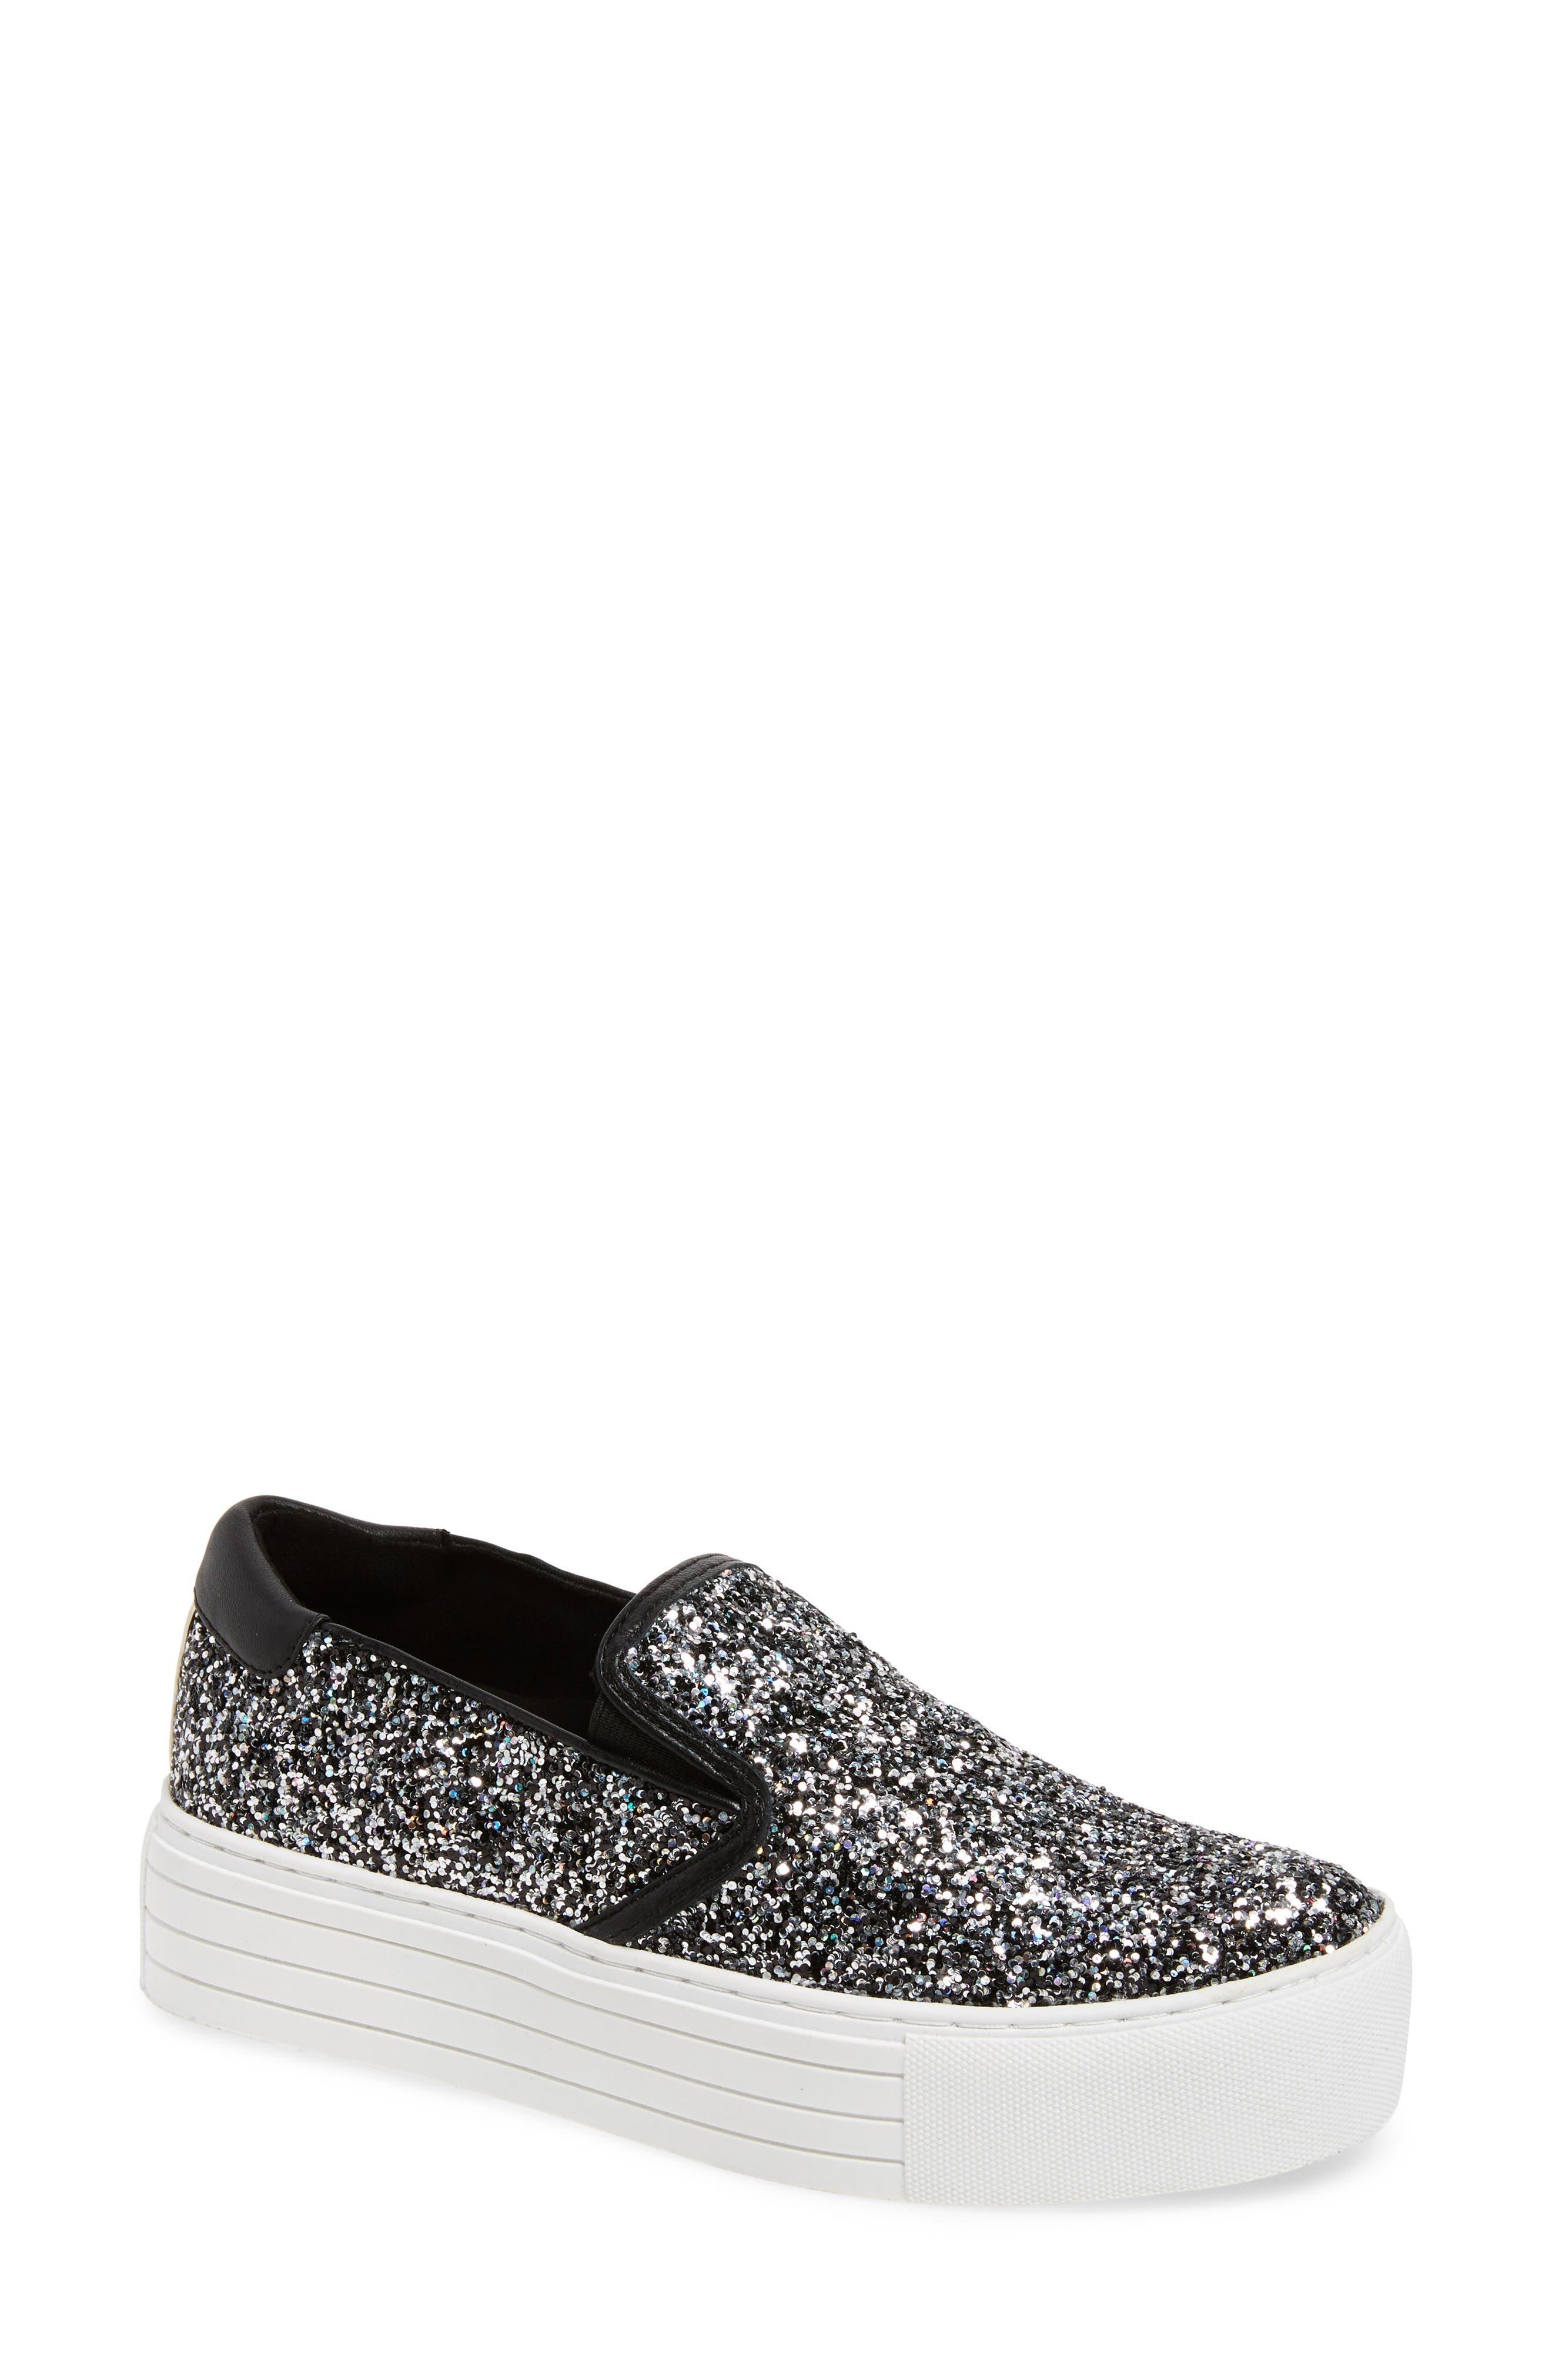 KENNETH COLE NEW YORK Joanie Slip-On Platform Sneaker